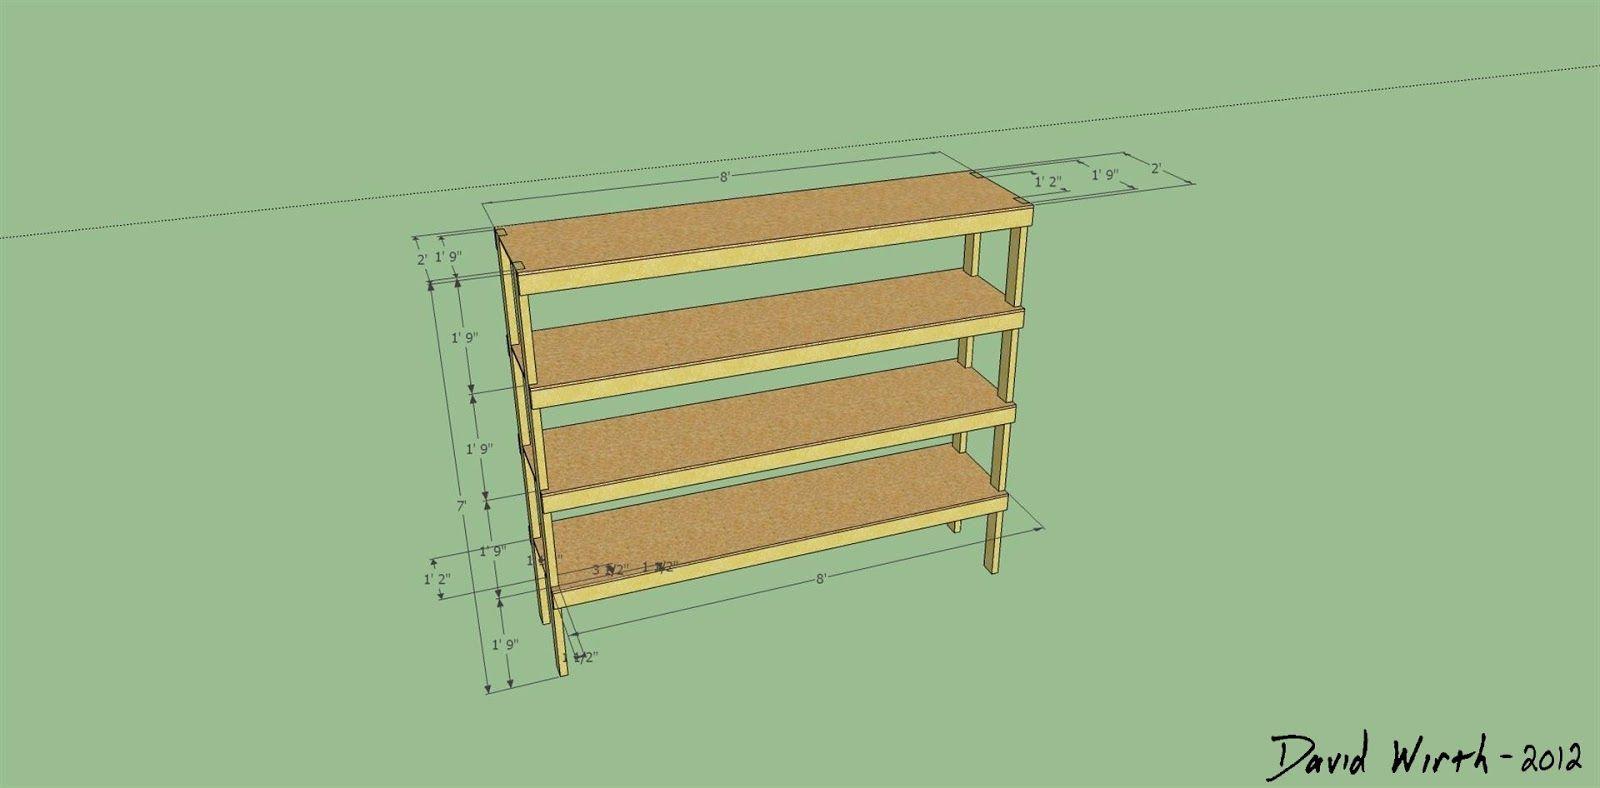 Google Sketchup Wood Shelf Design Wood Shelf Dimensions 2x4